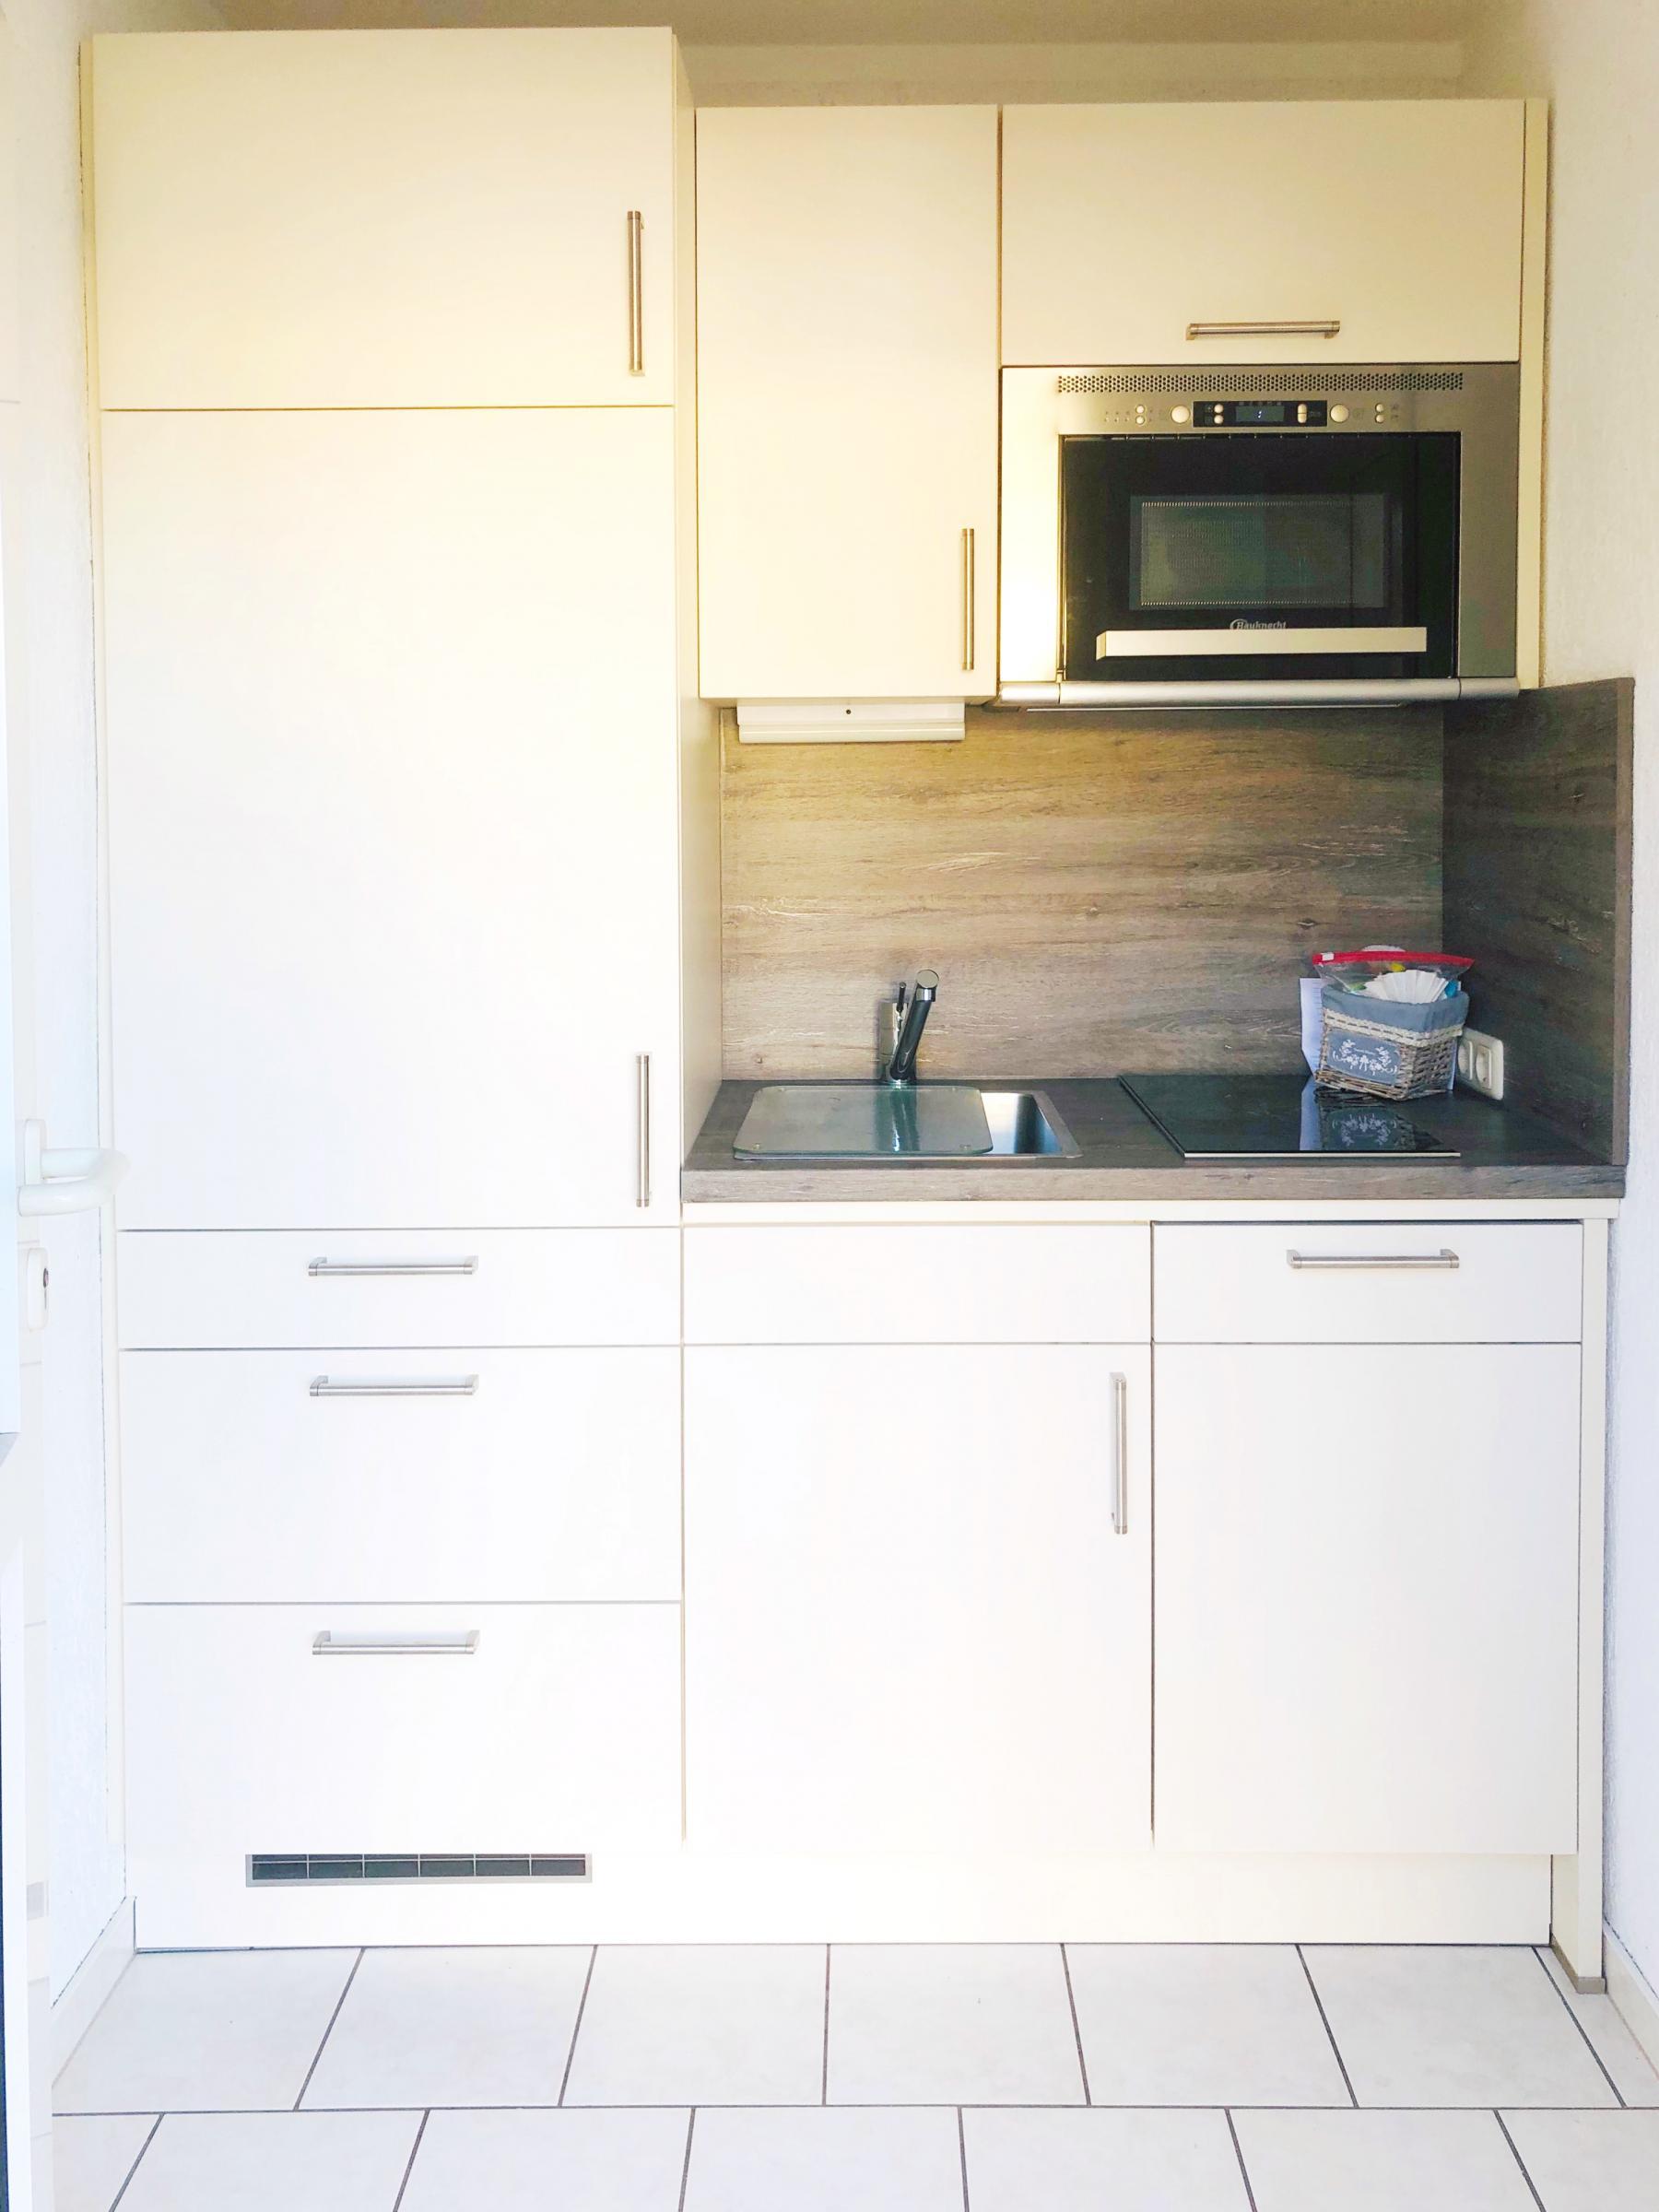 Neue Mini-Küche  - Geschirrspüler, Herd, Backofen, Kühlschrank